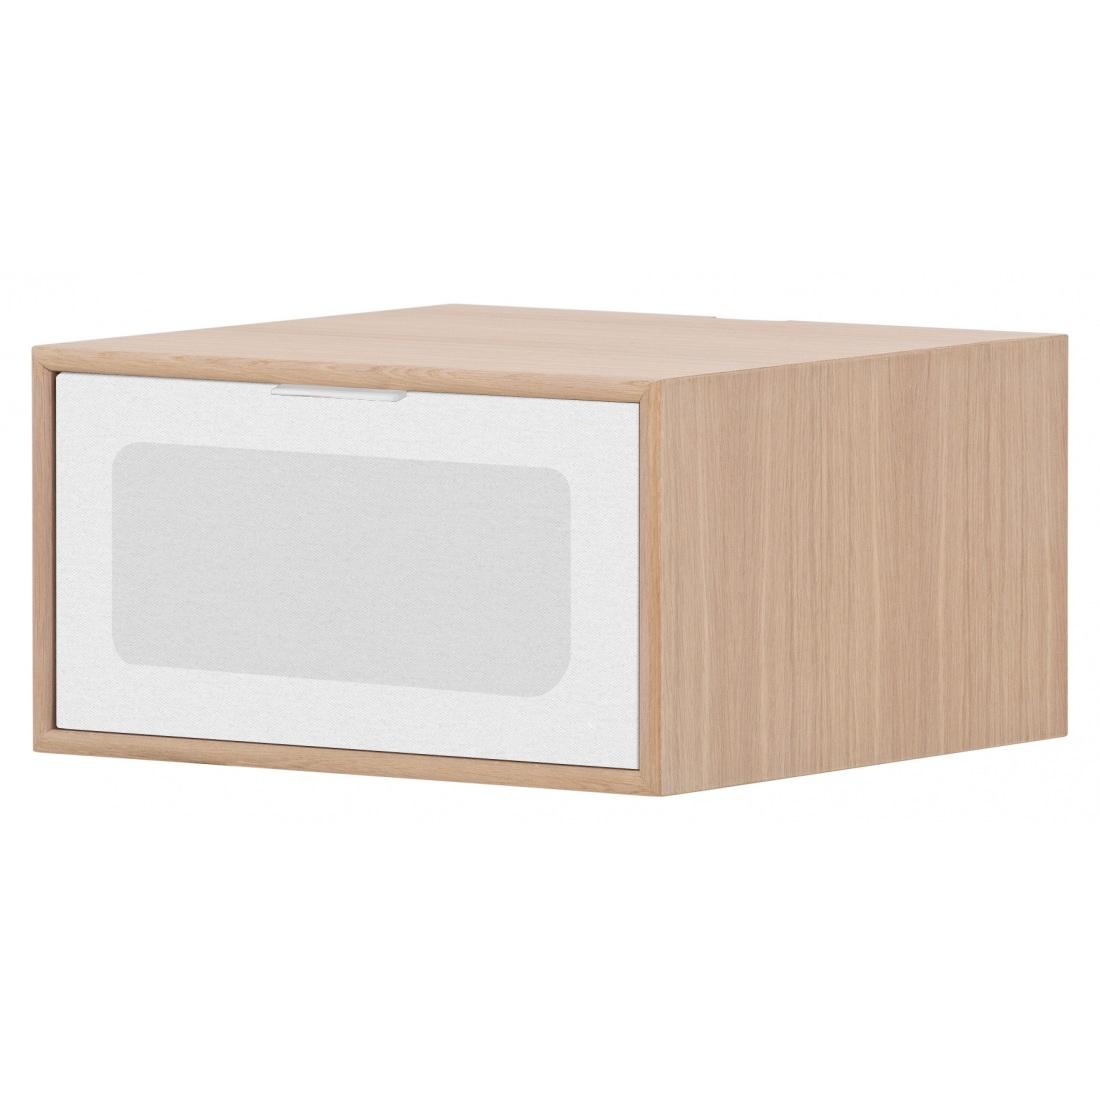 Lowboard Eiche Weiss Sideboard Tv Schrank Moebel Liebe Com